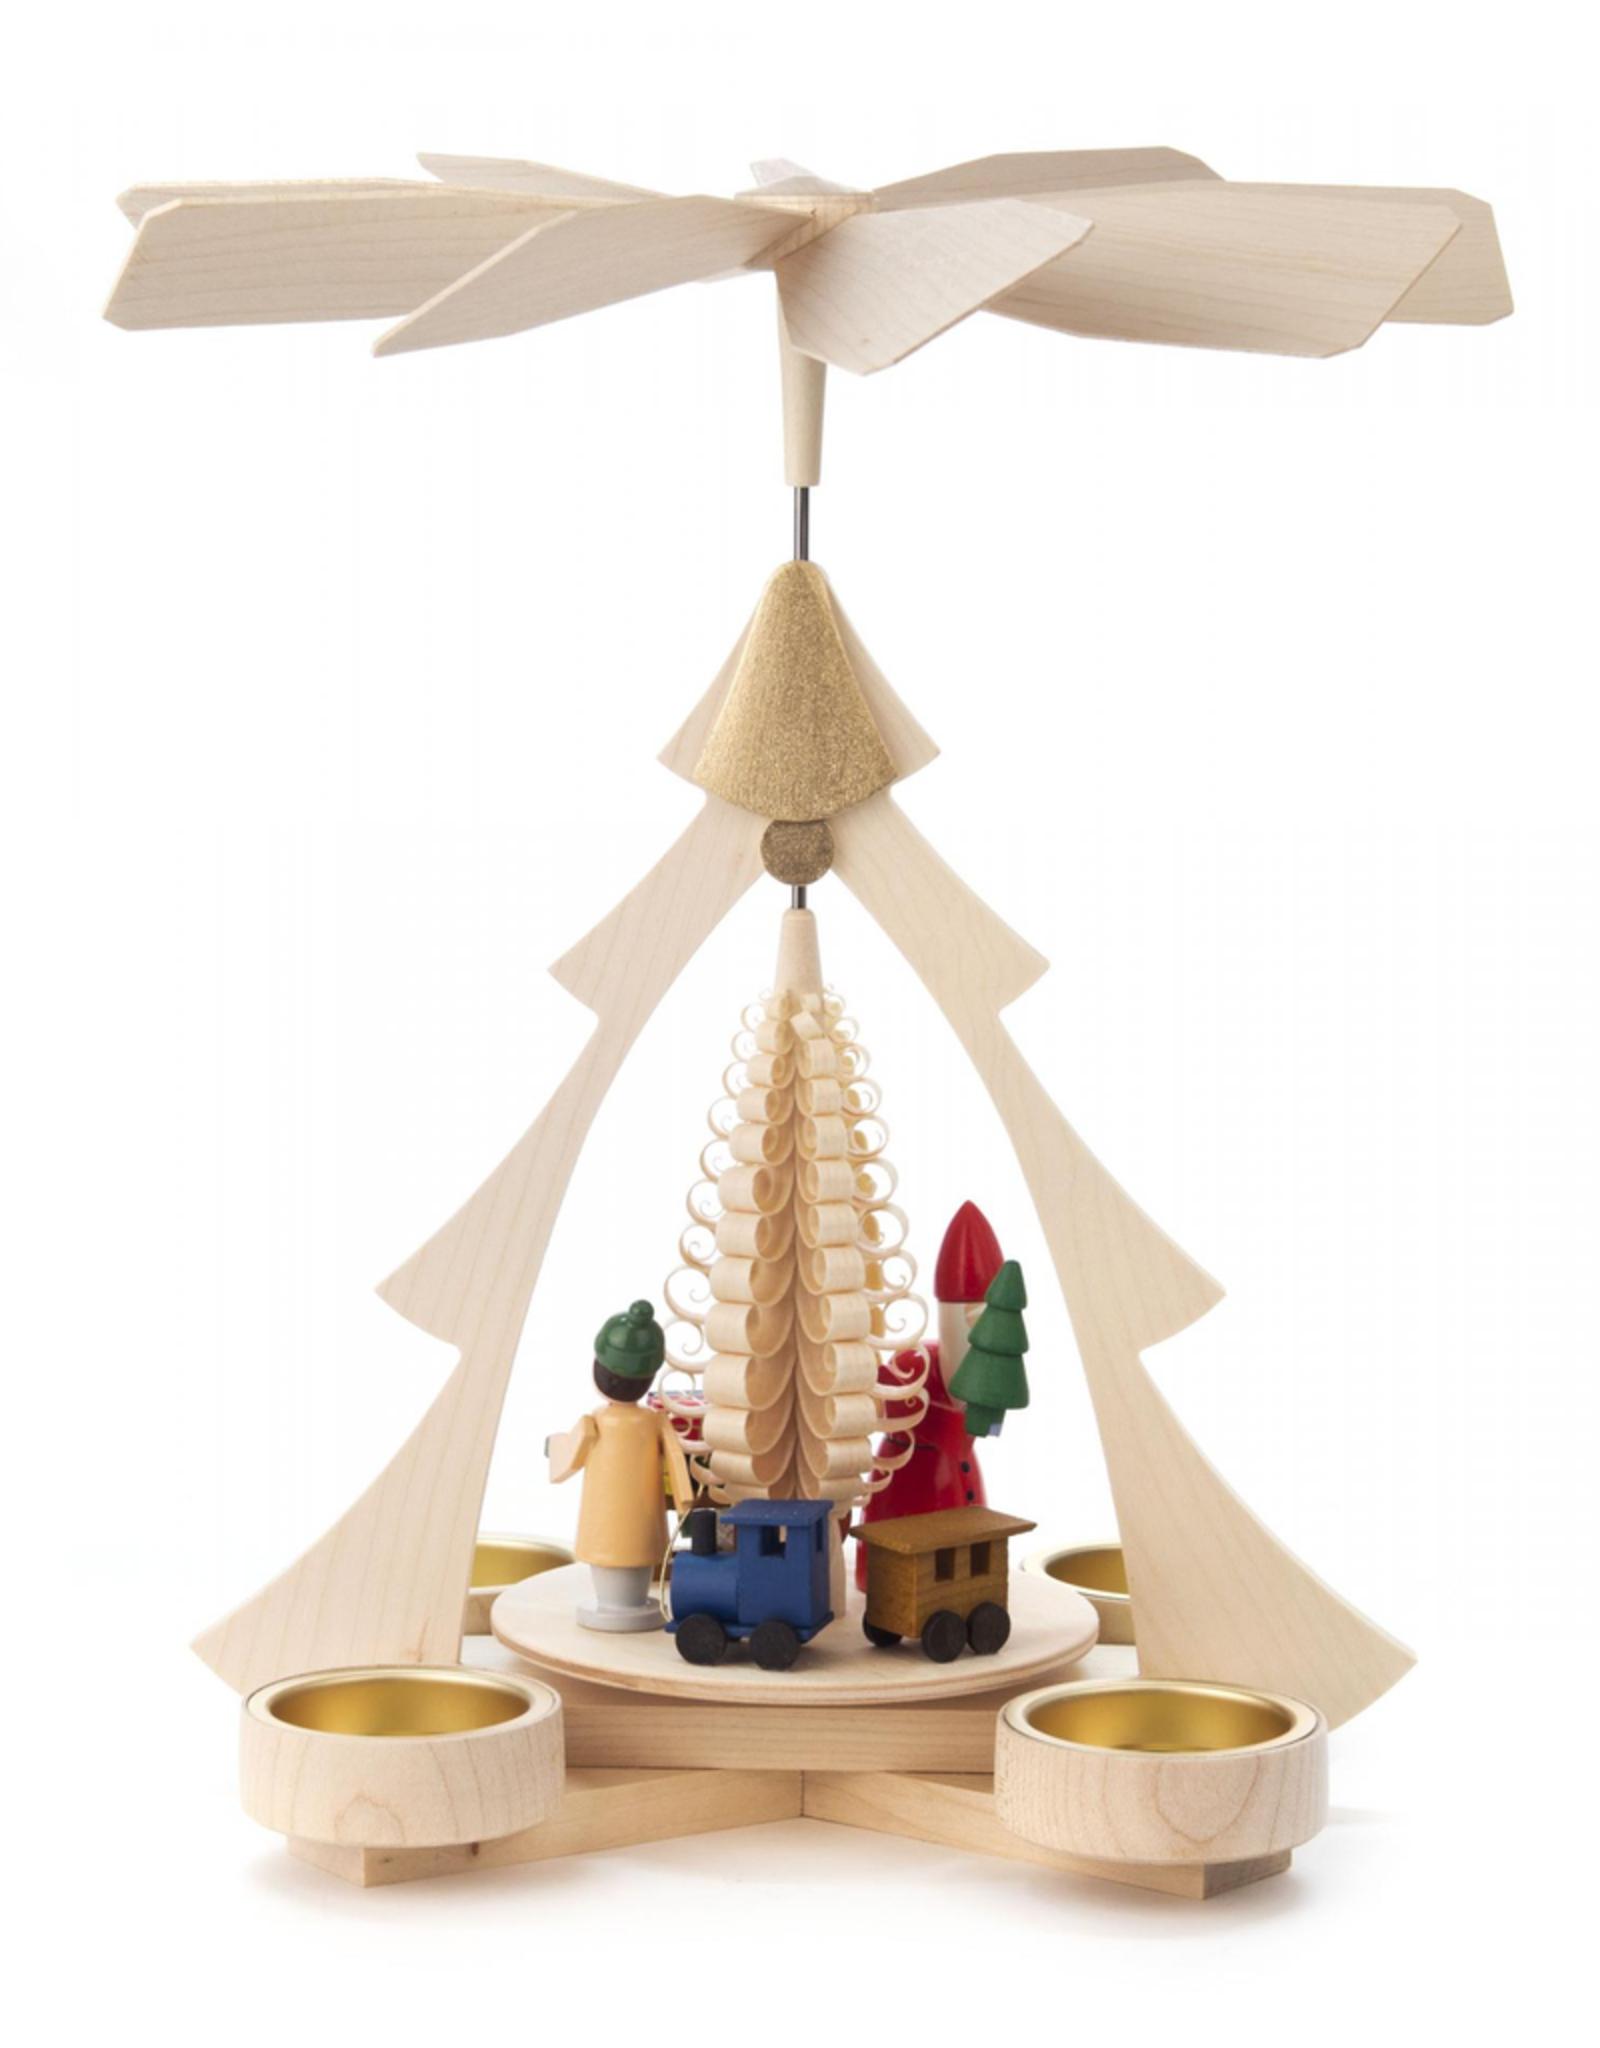 Pyramid with Santa, Train for Tealight, 26cm